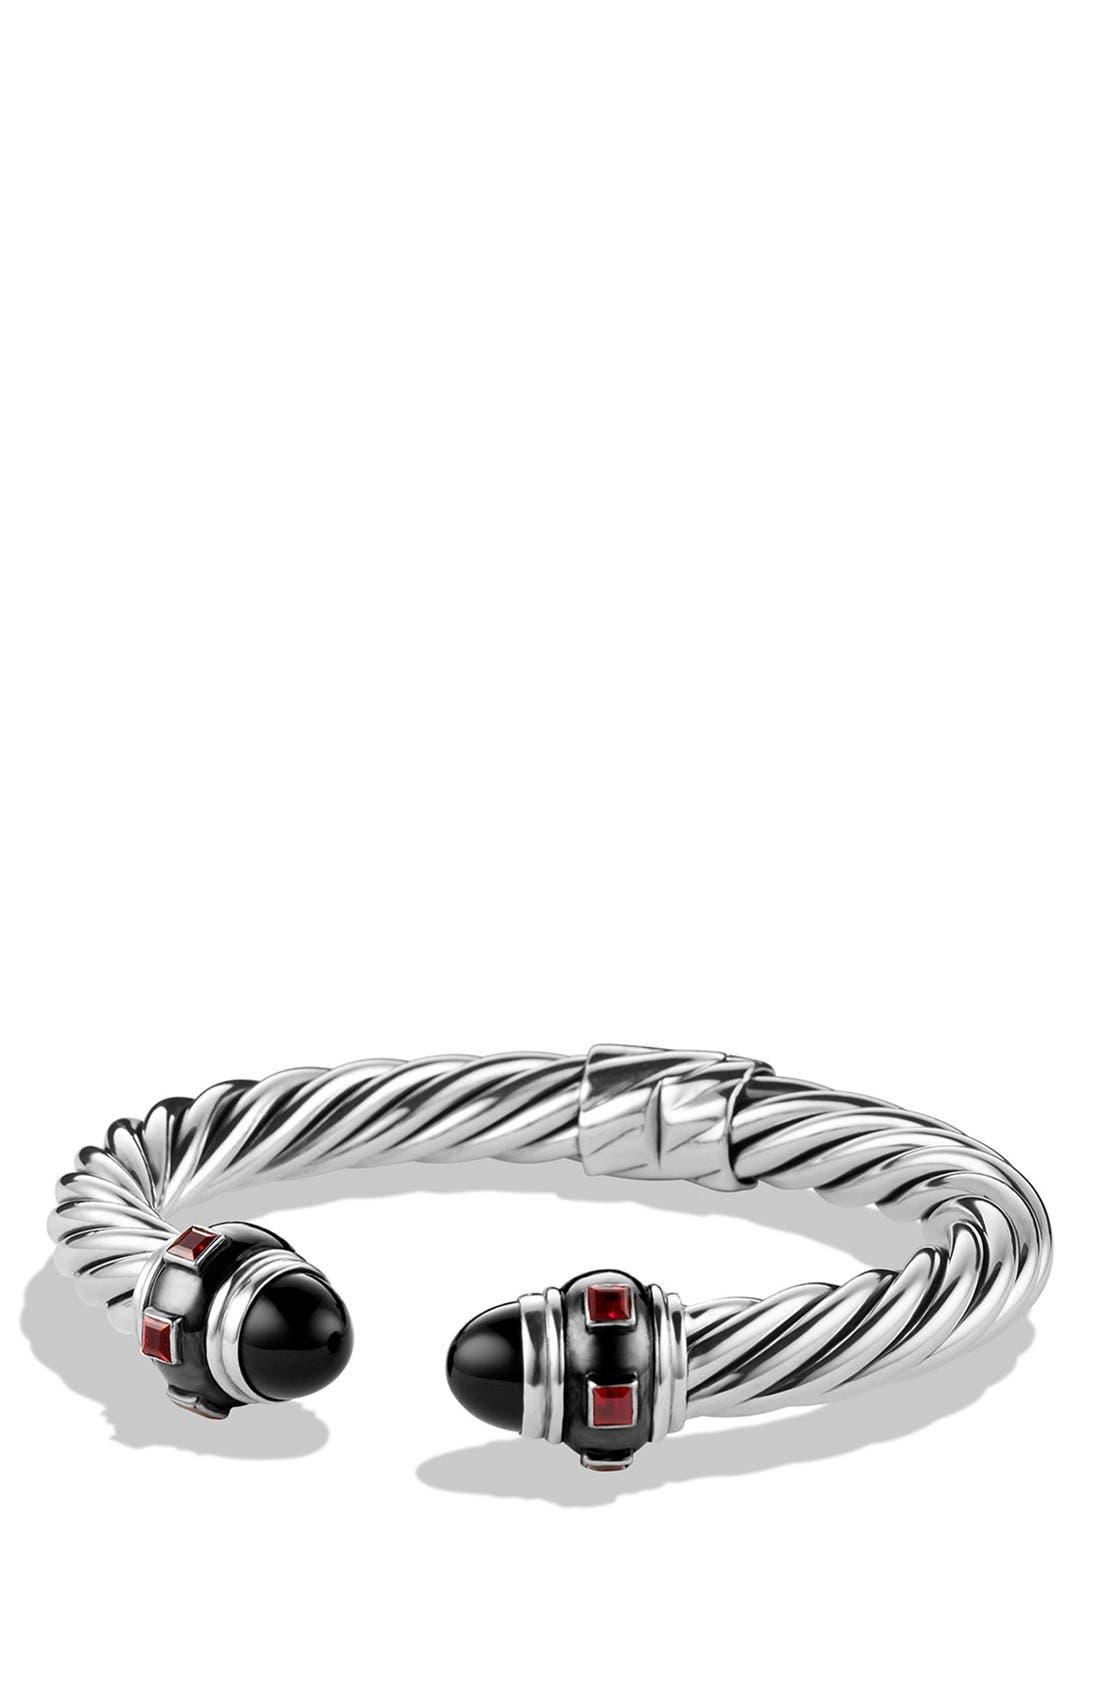 Alternate Image 1 Selected - David Yurman 'Renaissance' Bracelet with Black Onyx and Ruby